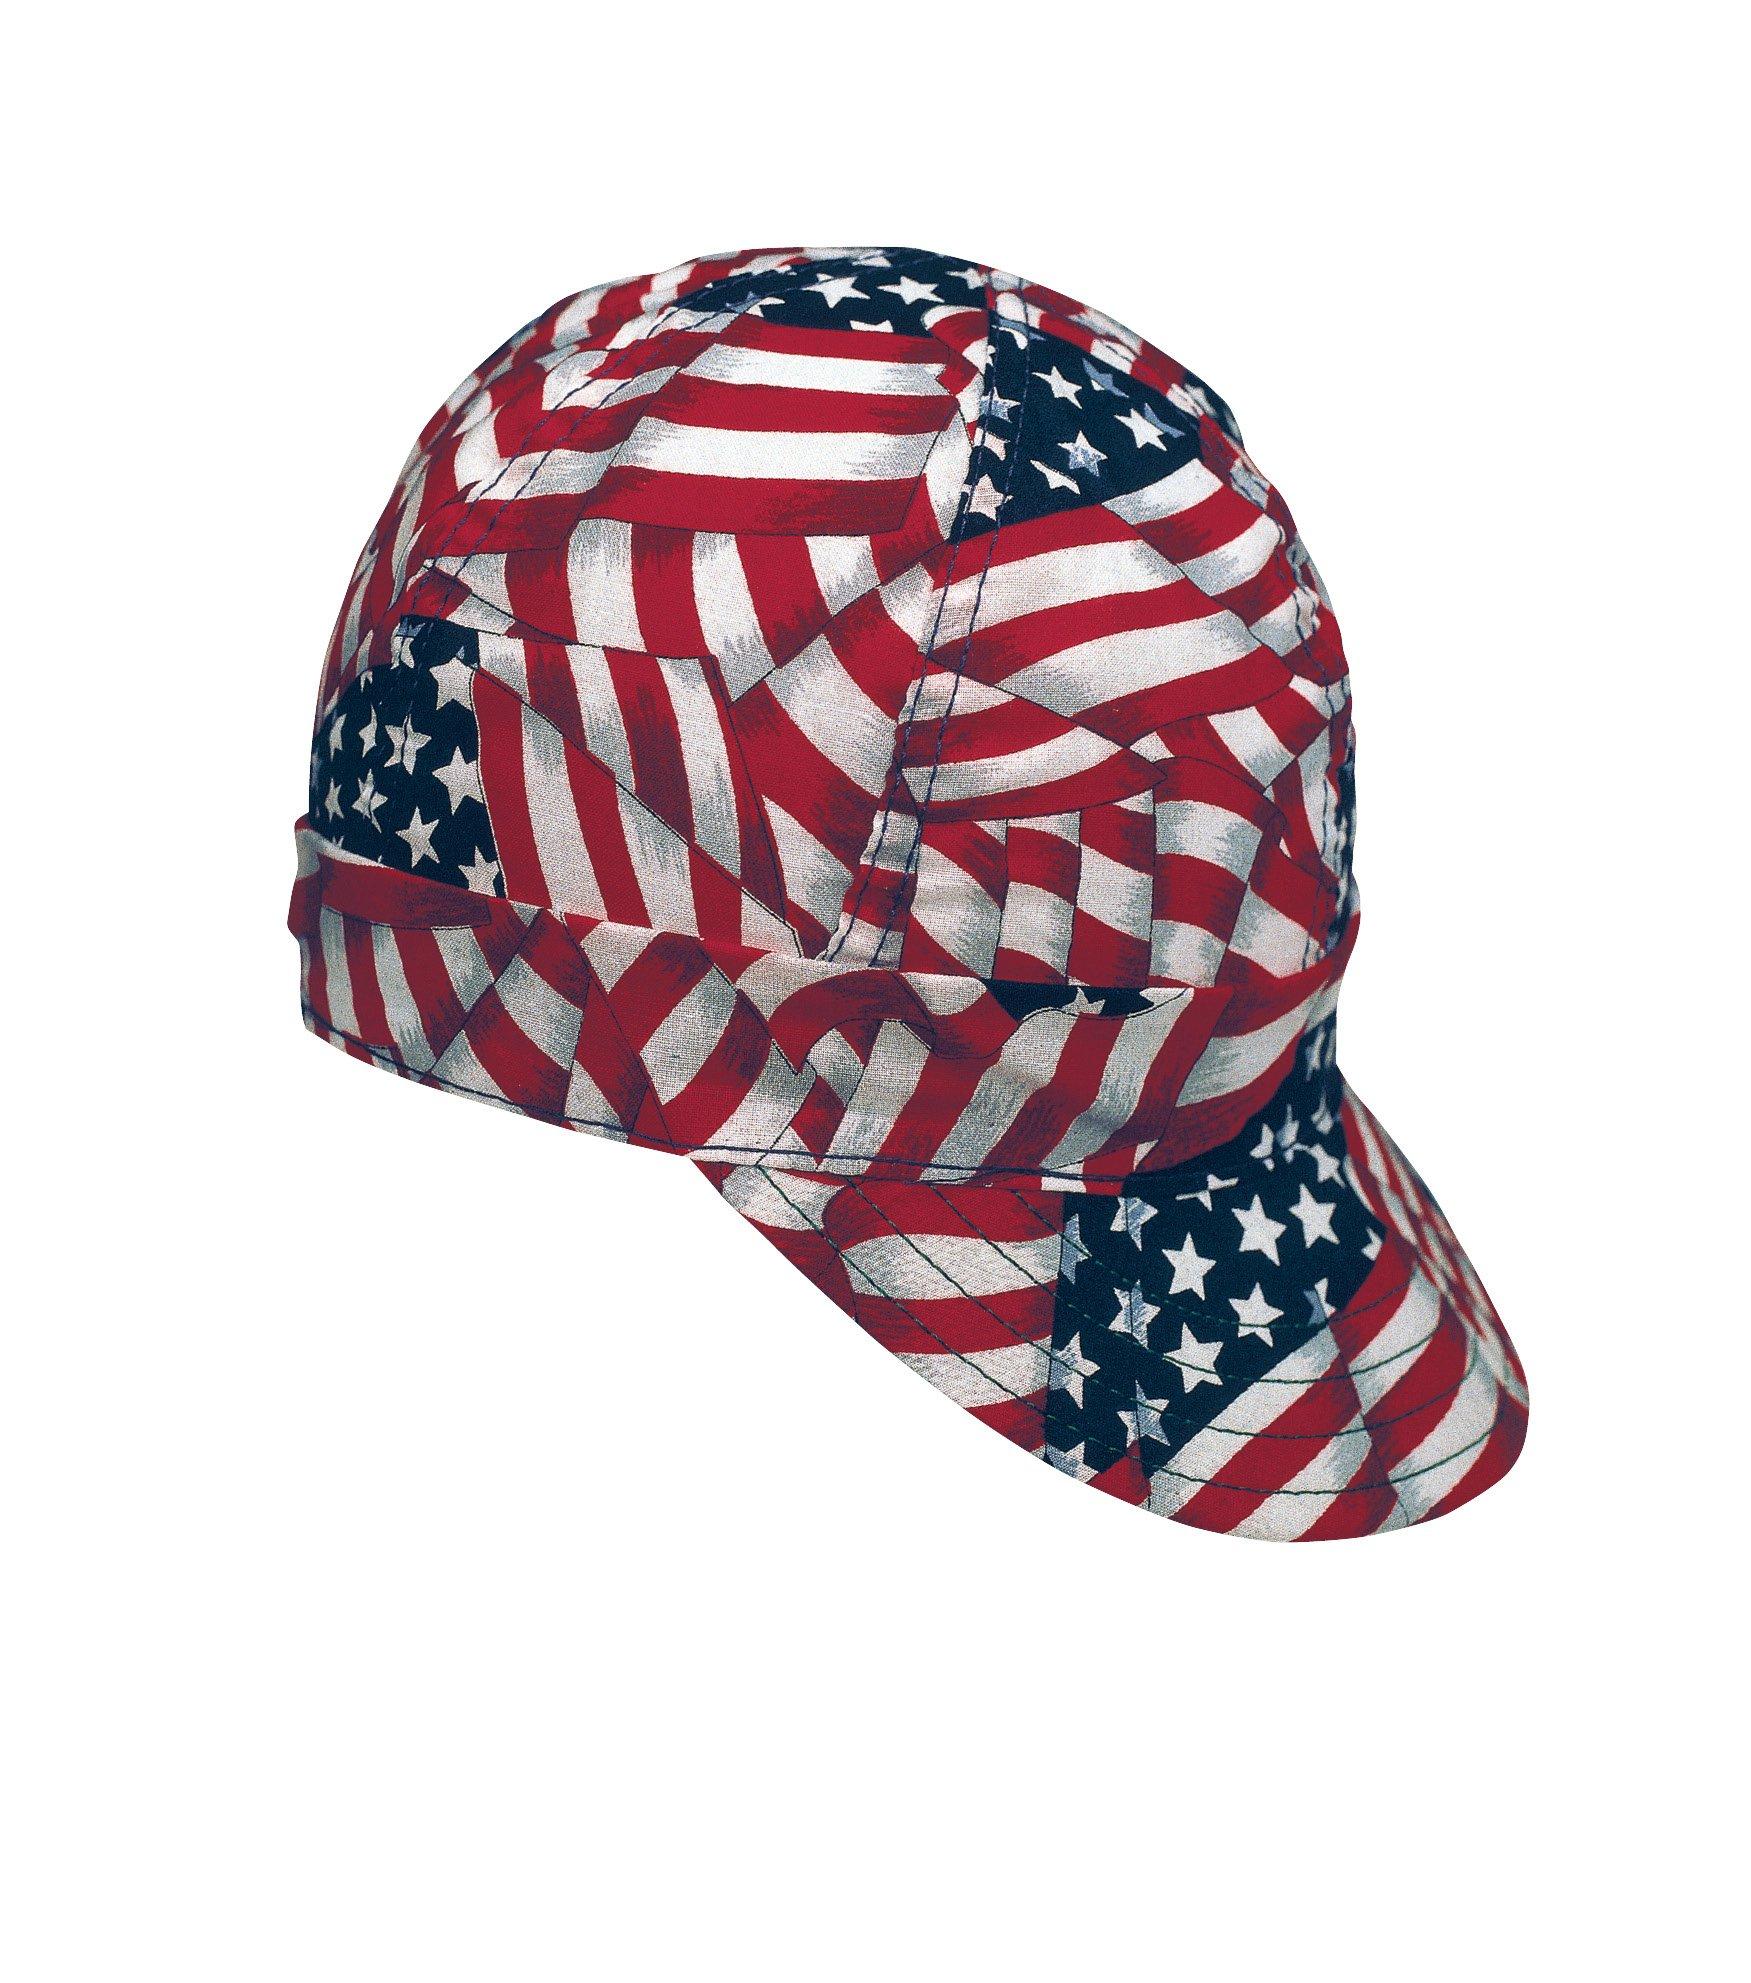 Mutual Industries 00336-00000-0007 Kromer USA Flag Style Welder Cap 7, Cotton, Length 5'', Width 6''